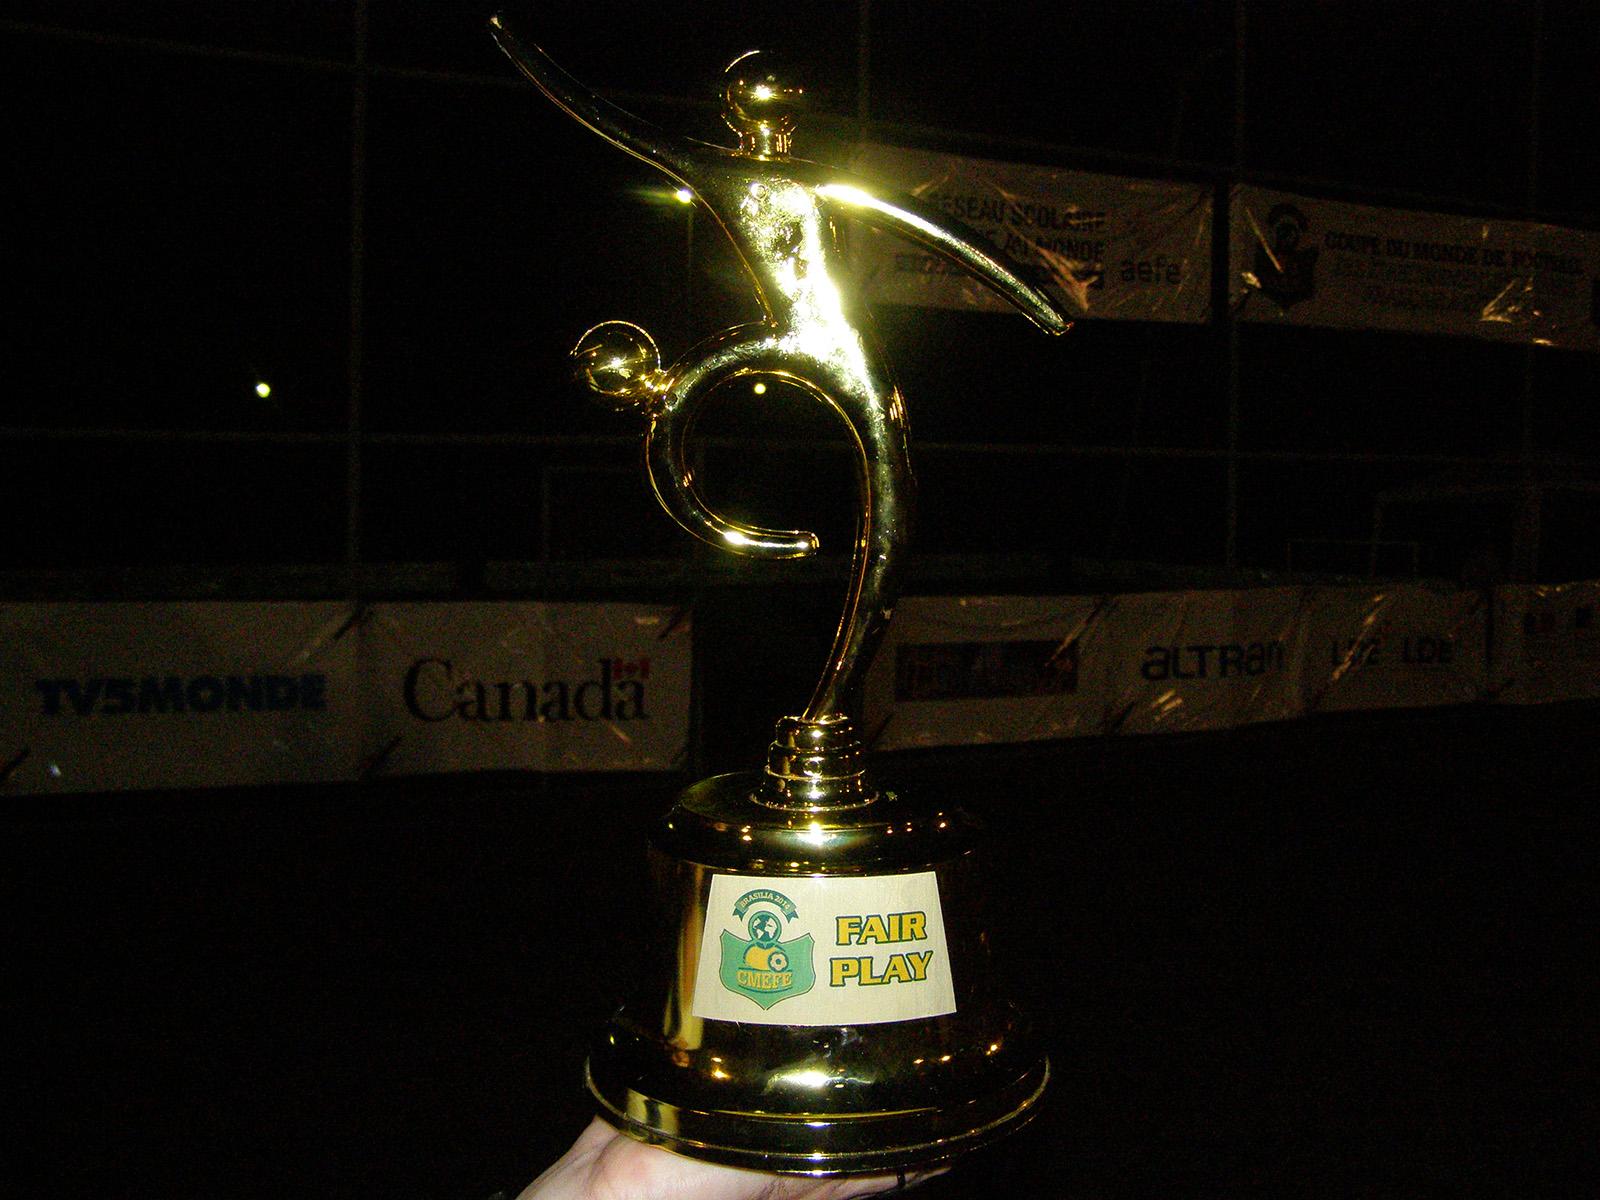 CMEFE 2014, la coupe du fair-play - το κύπελλο fairplay-2